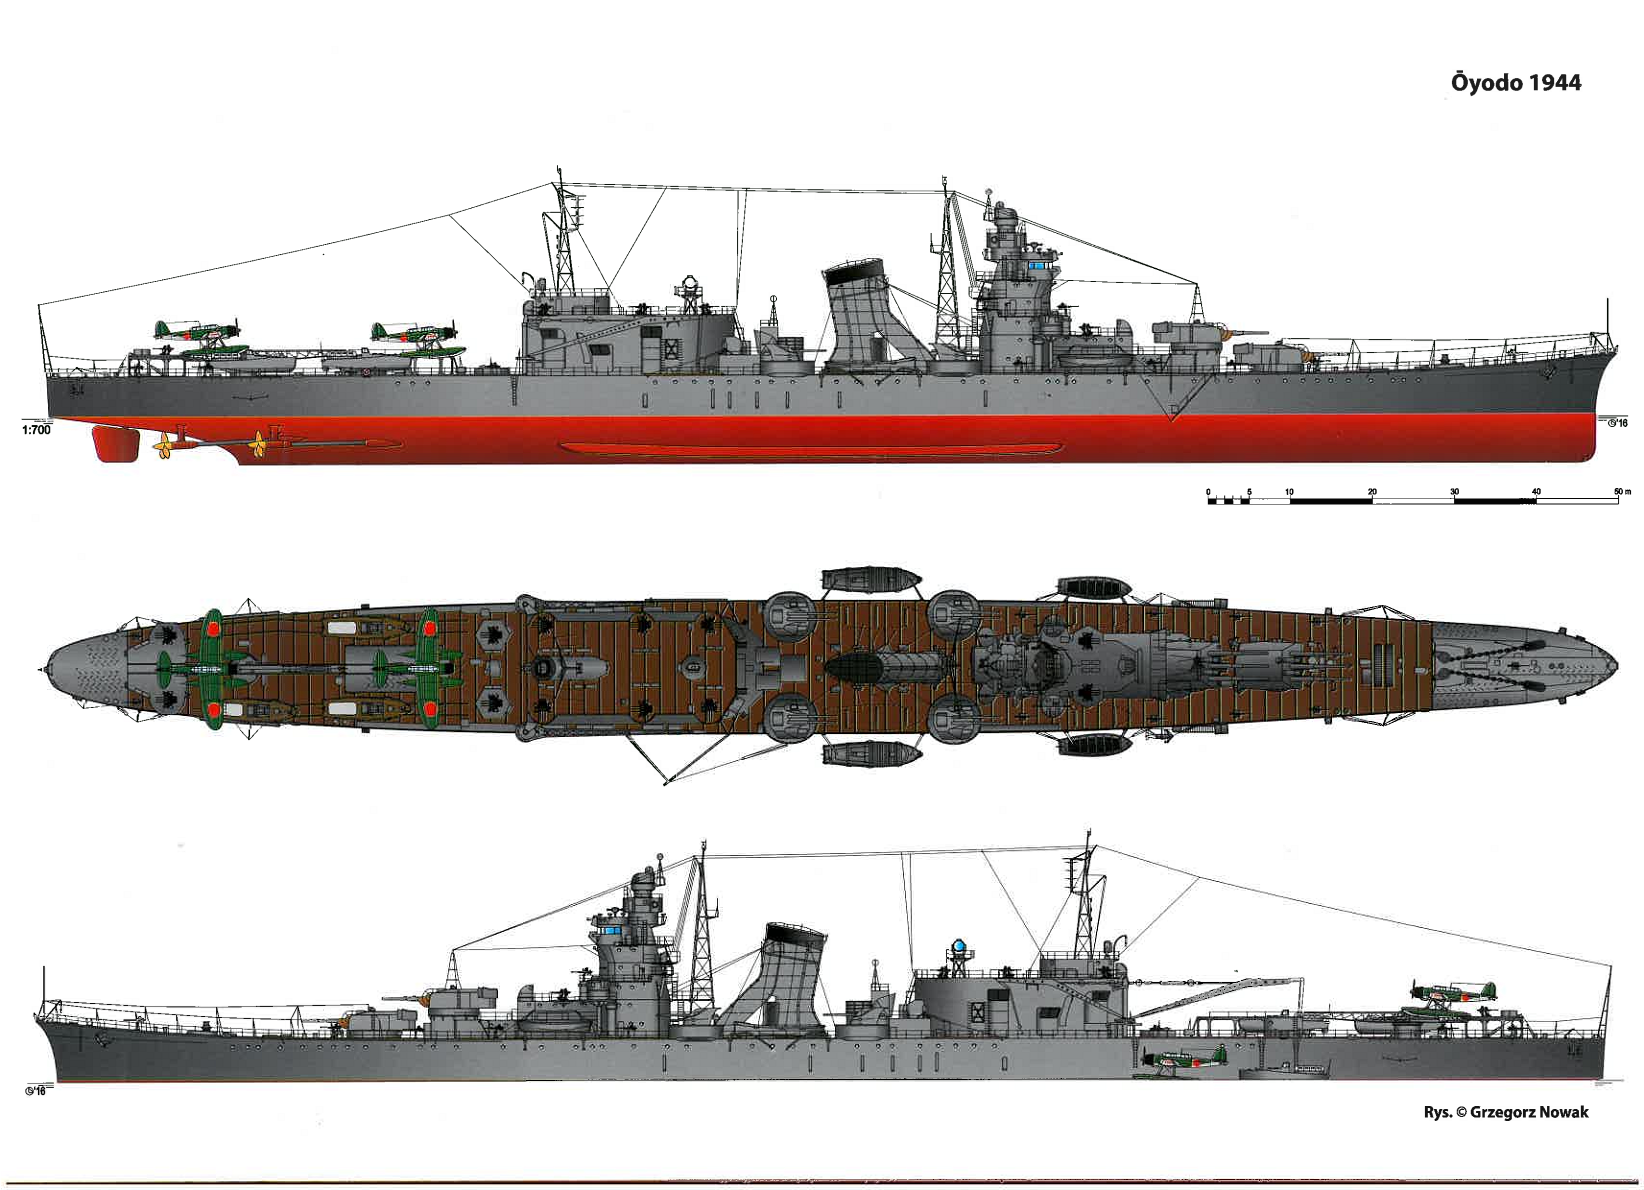 hight resolution of ijn light cruiser oyodo soviet navy heavy cruiser imperial japanese navy